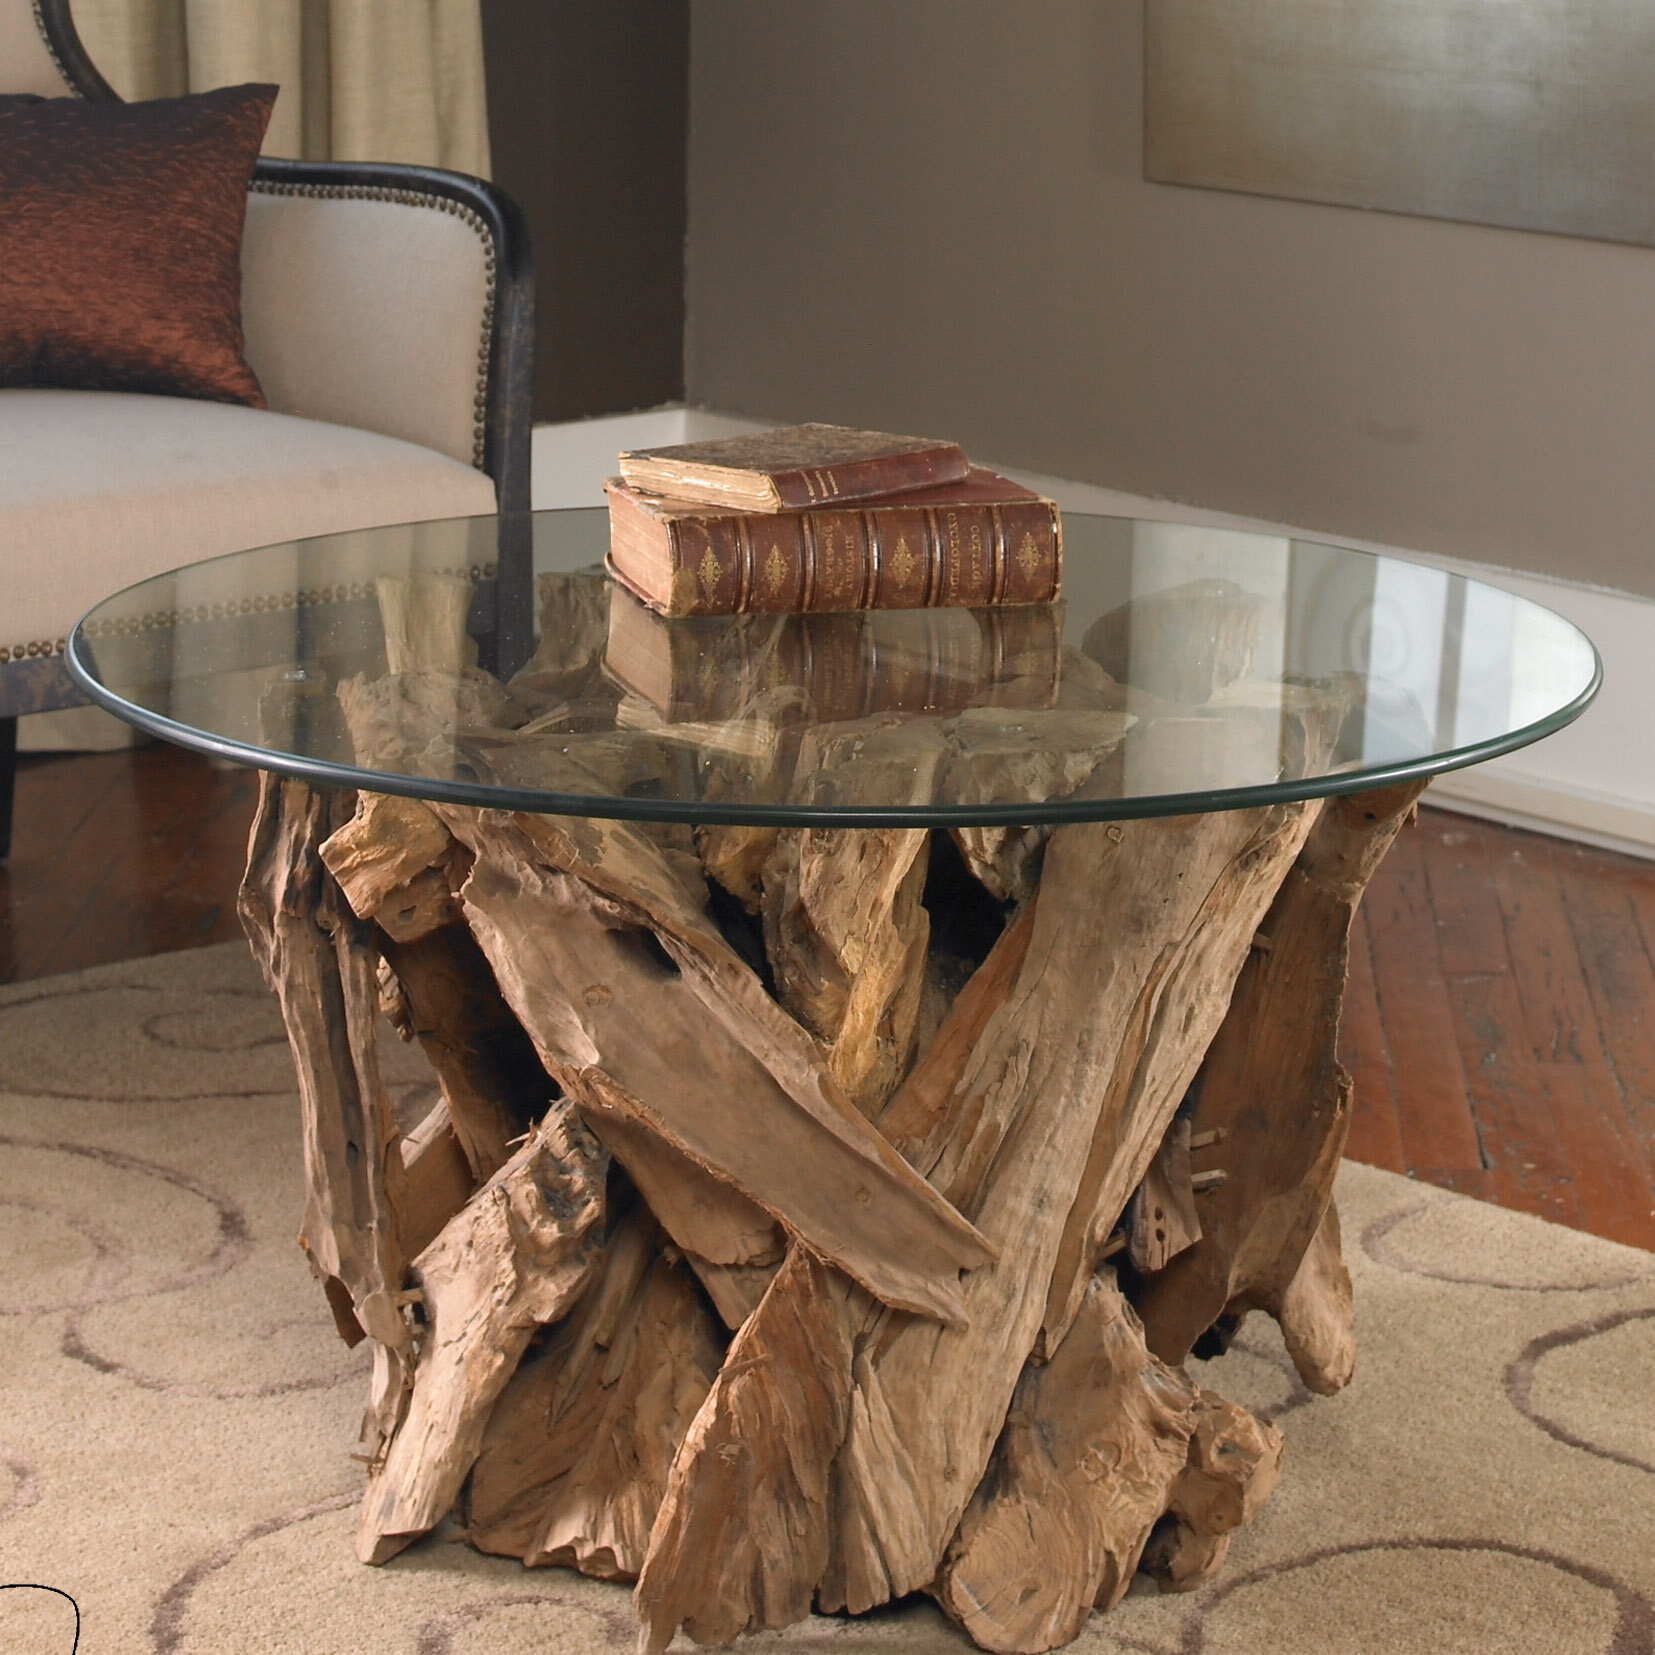 union rustic cindi driftwood coffee table reviews wayfair rh wayfair com driftwood coffee table ebay driftwood coffee tables for sale